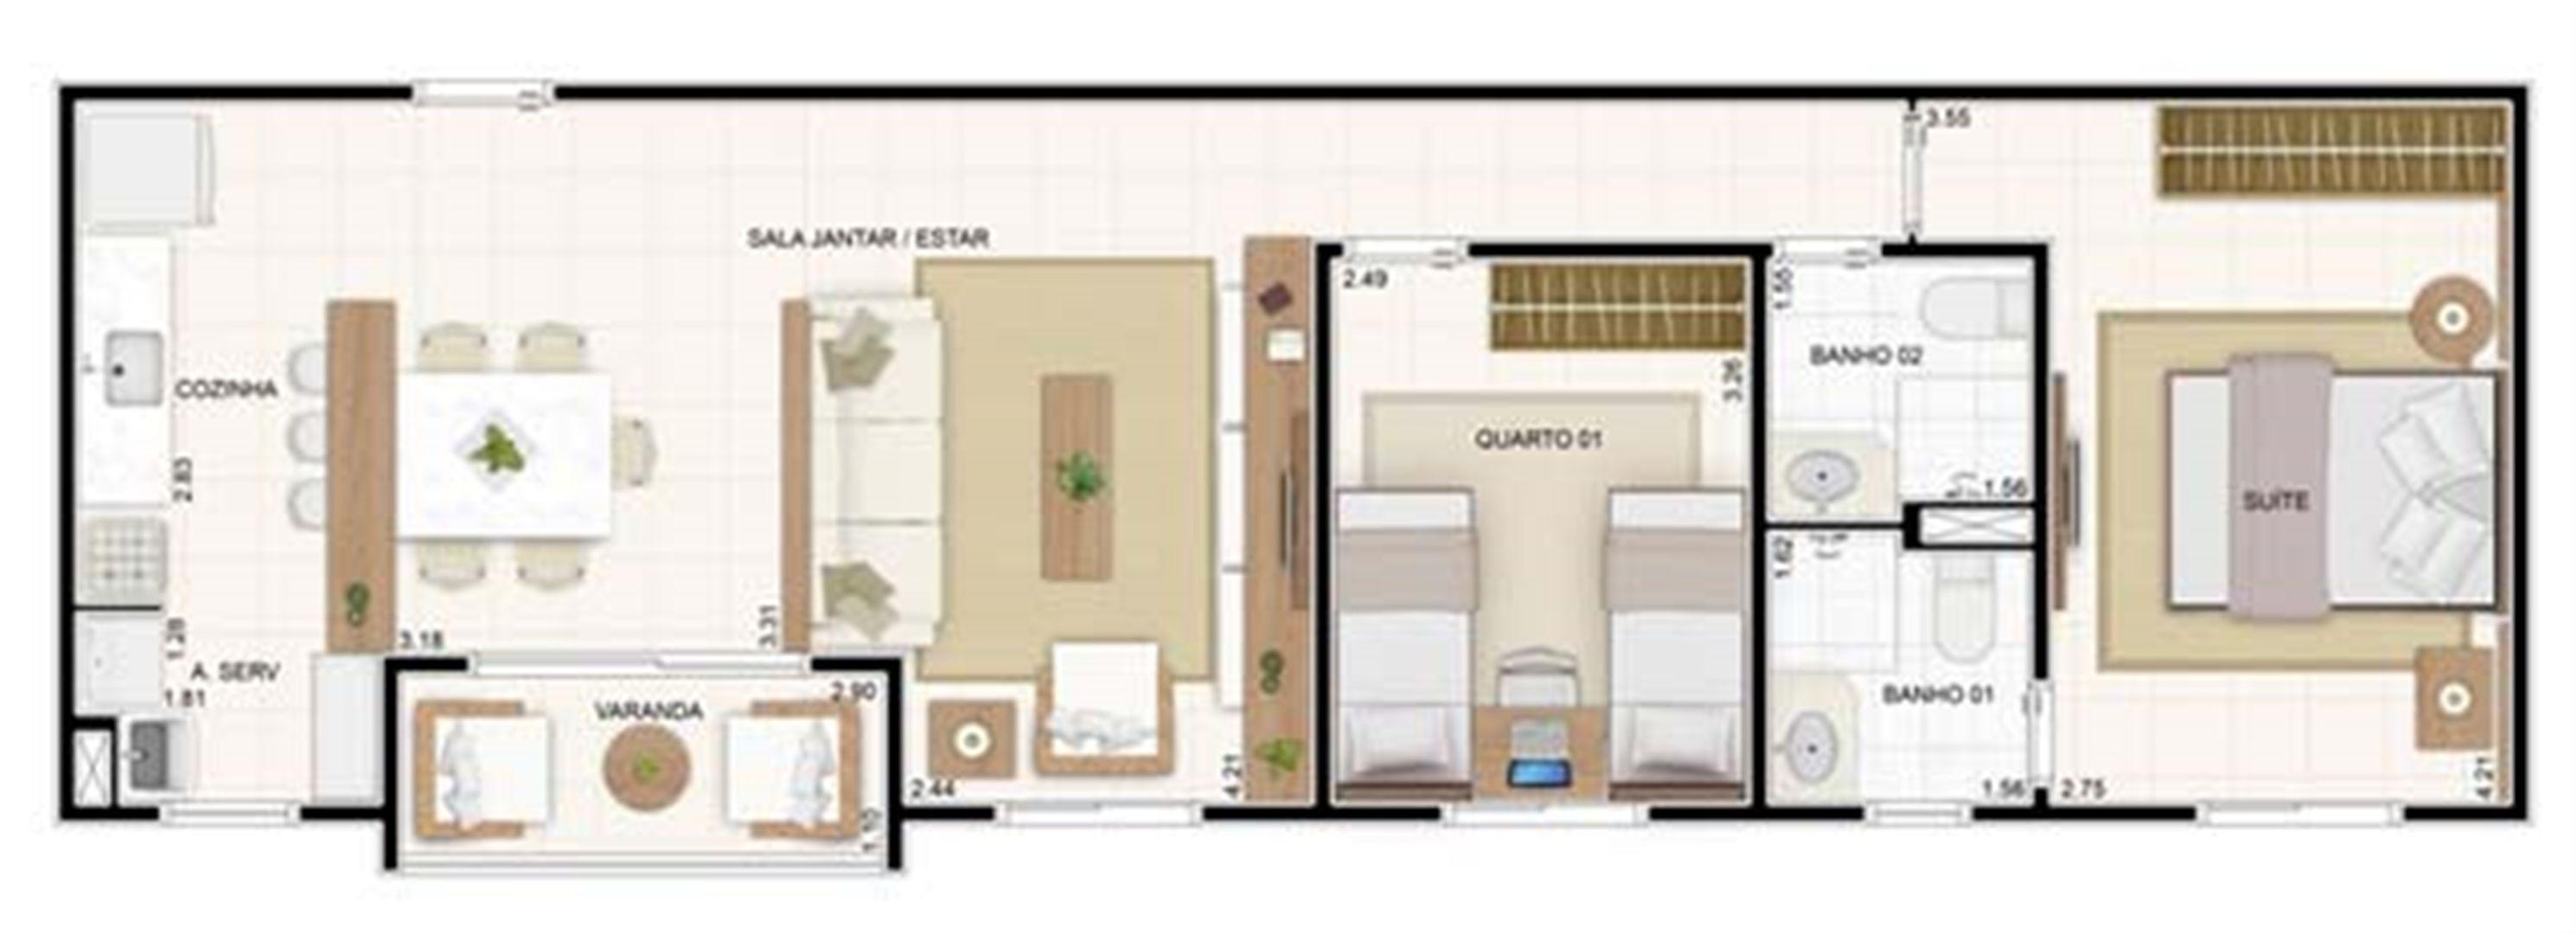 3 dorms Sala Ampliada 67,35m²   Vita 2 Residencial Clube – Apartamento no  Pitimbu - Natal - Rio Grande do Norte